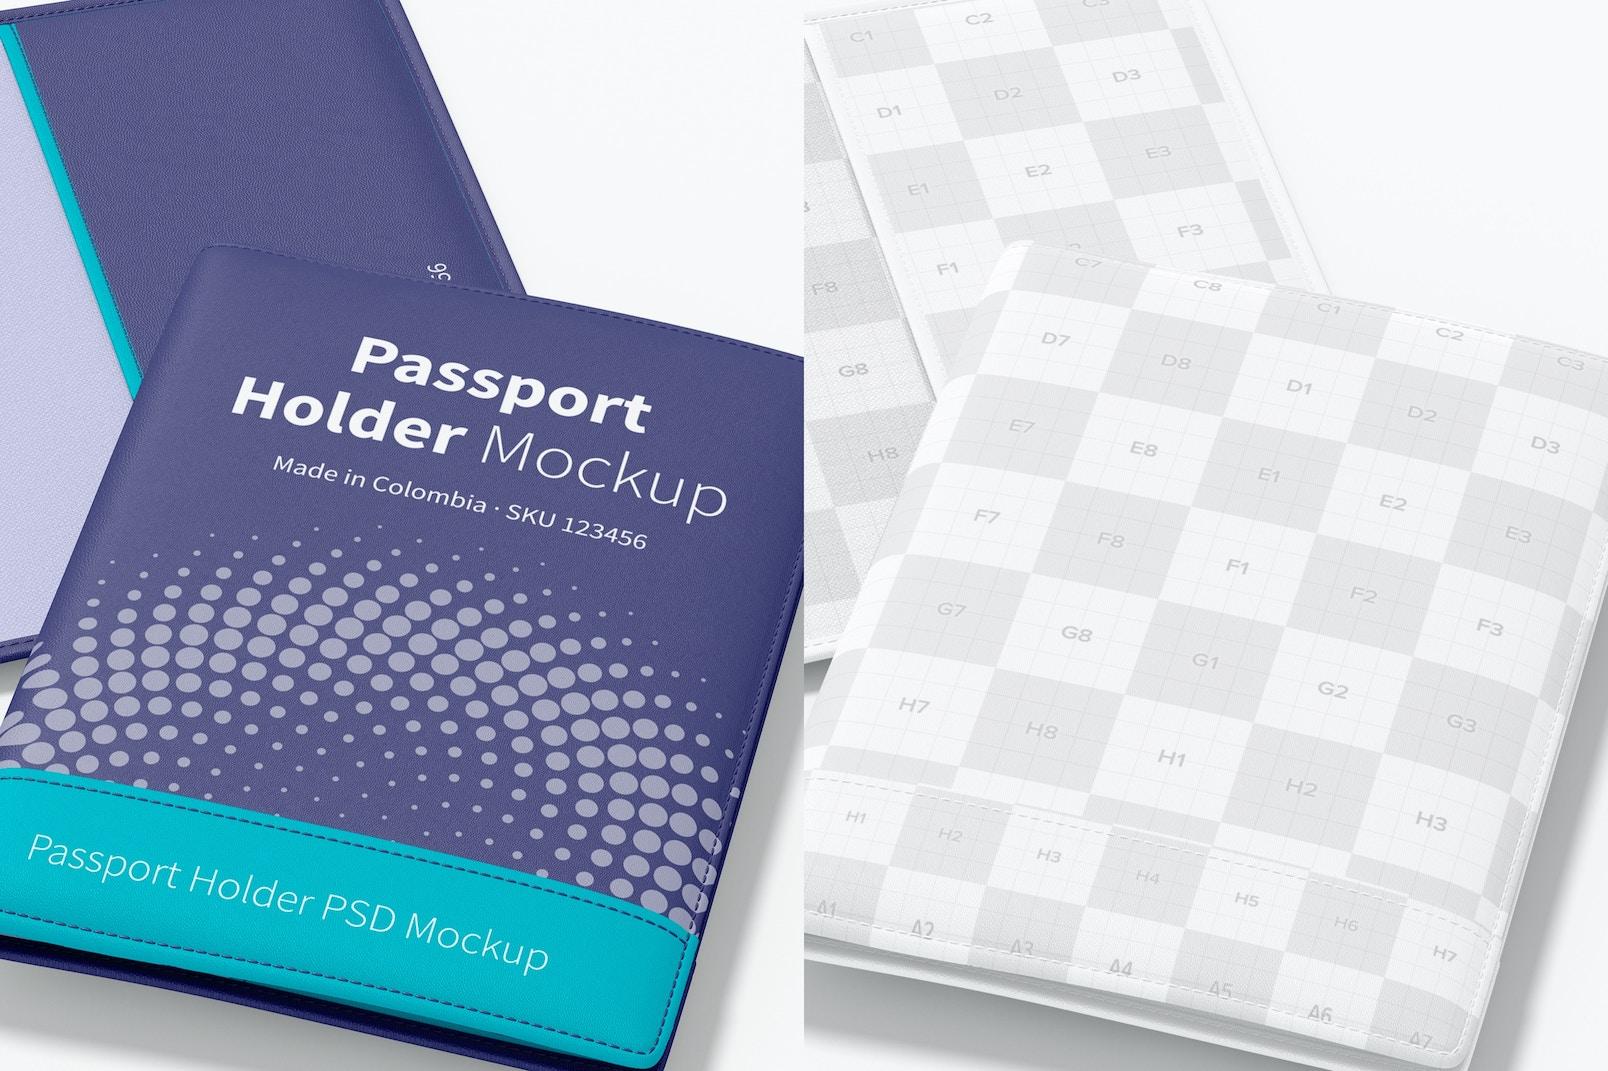 Passport Holder Mockup, Close Up